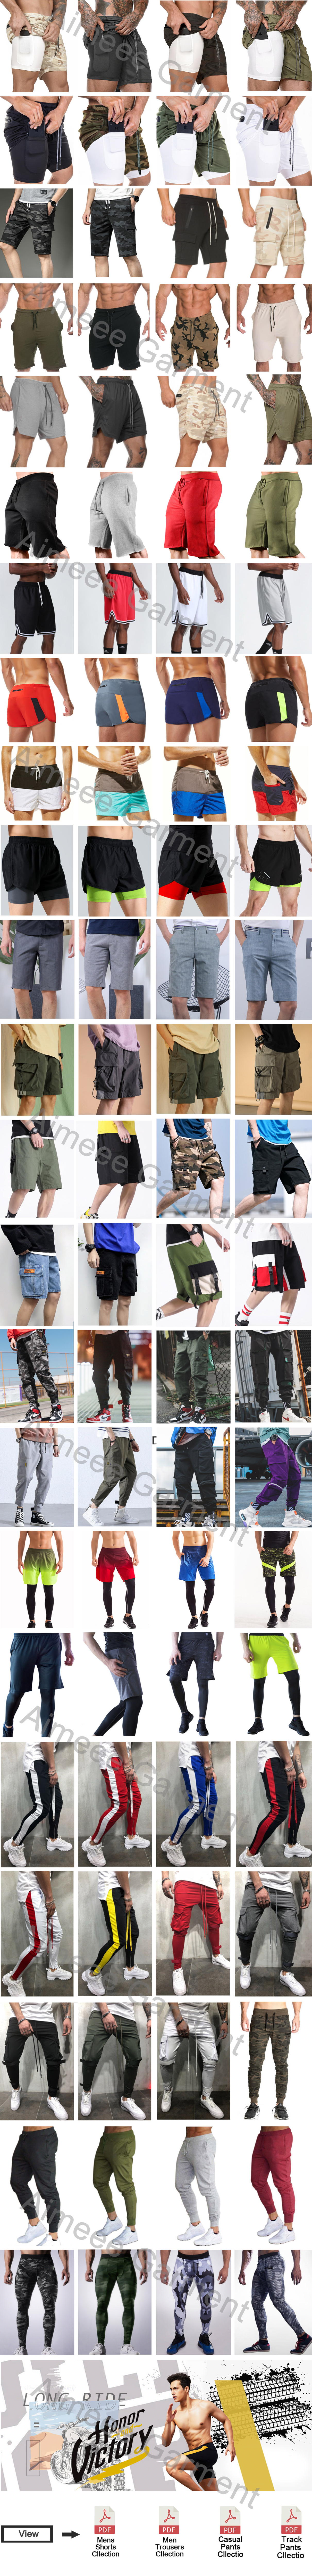 Custom Running Pants Fitness Jogging Gym Trousers Joggers Mens Sweatpants